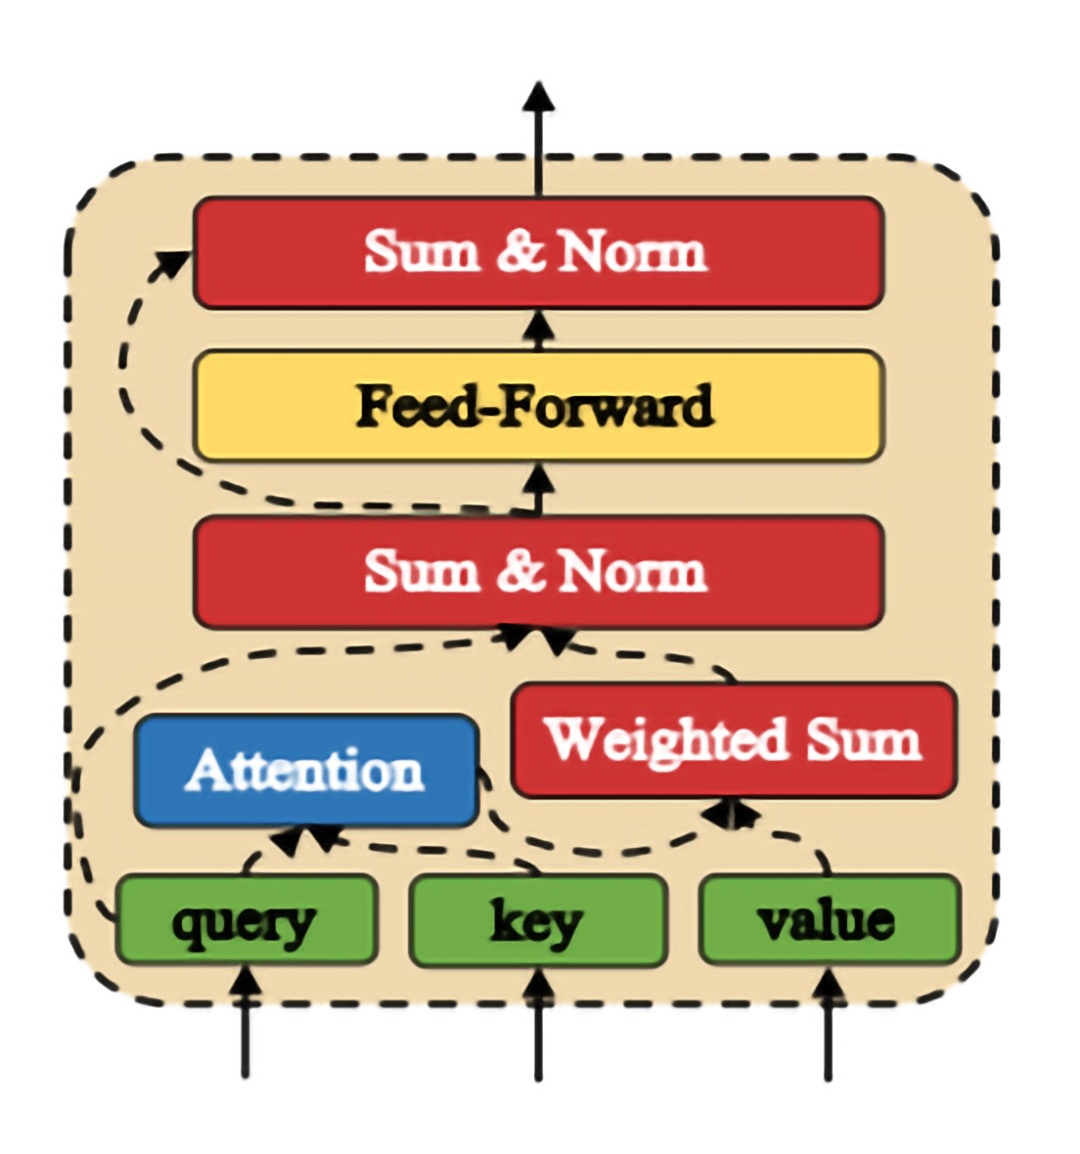 Figure 2: Attentive Module